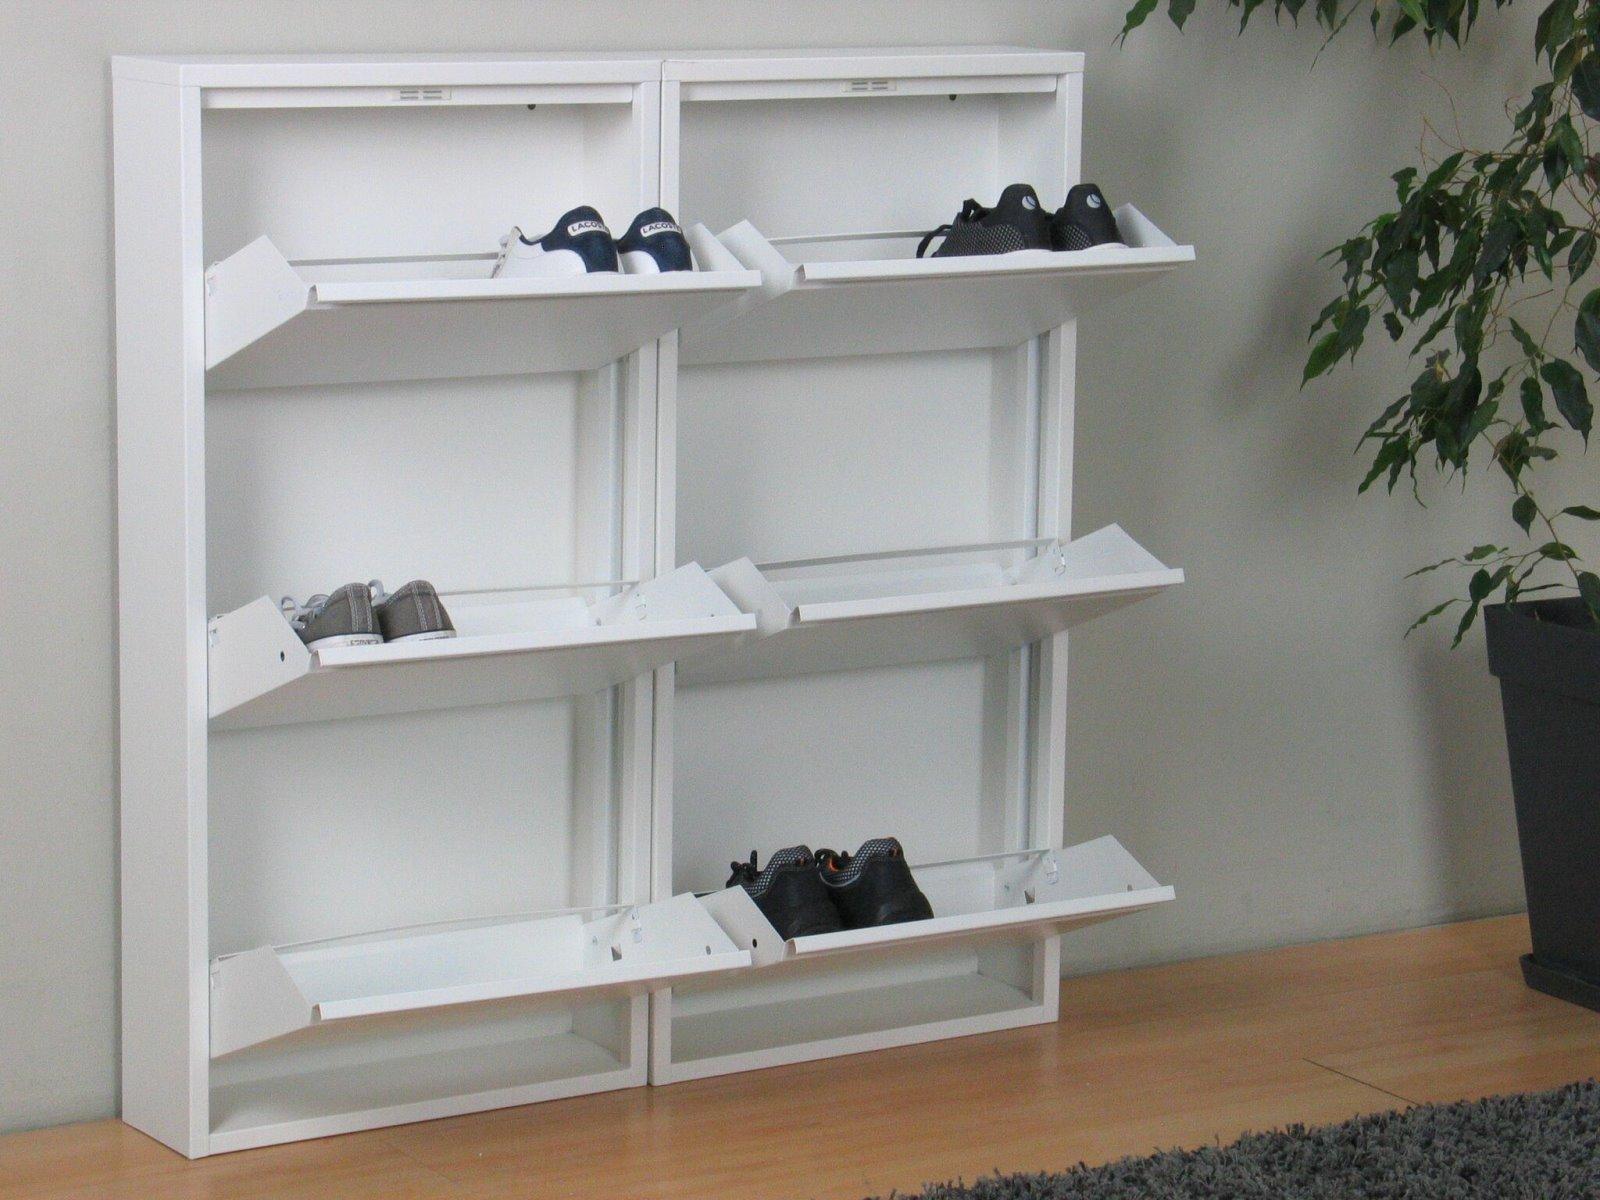 metall weiss 5 klappen best np uac metall schuhkipper regal wei klappen in ahnatal with metall. Black Bedroom Furniture Sets. Home Design Ideas